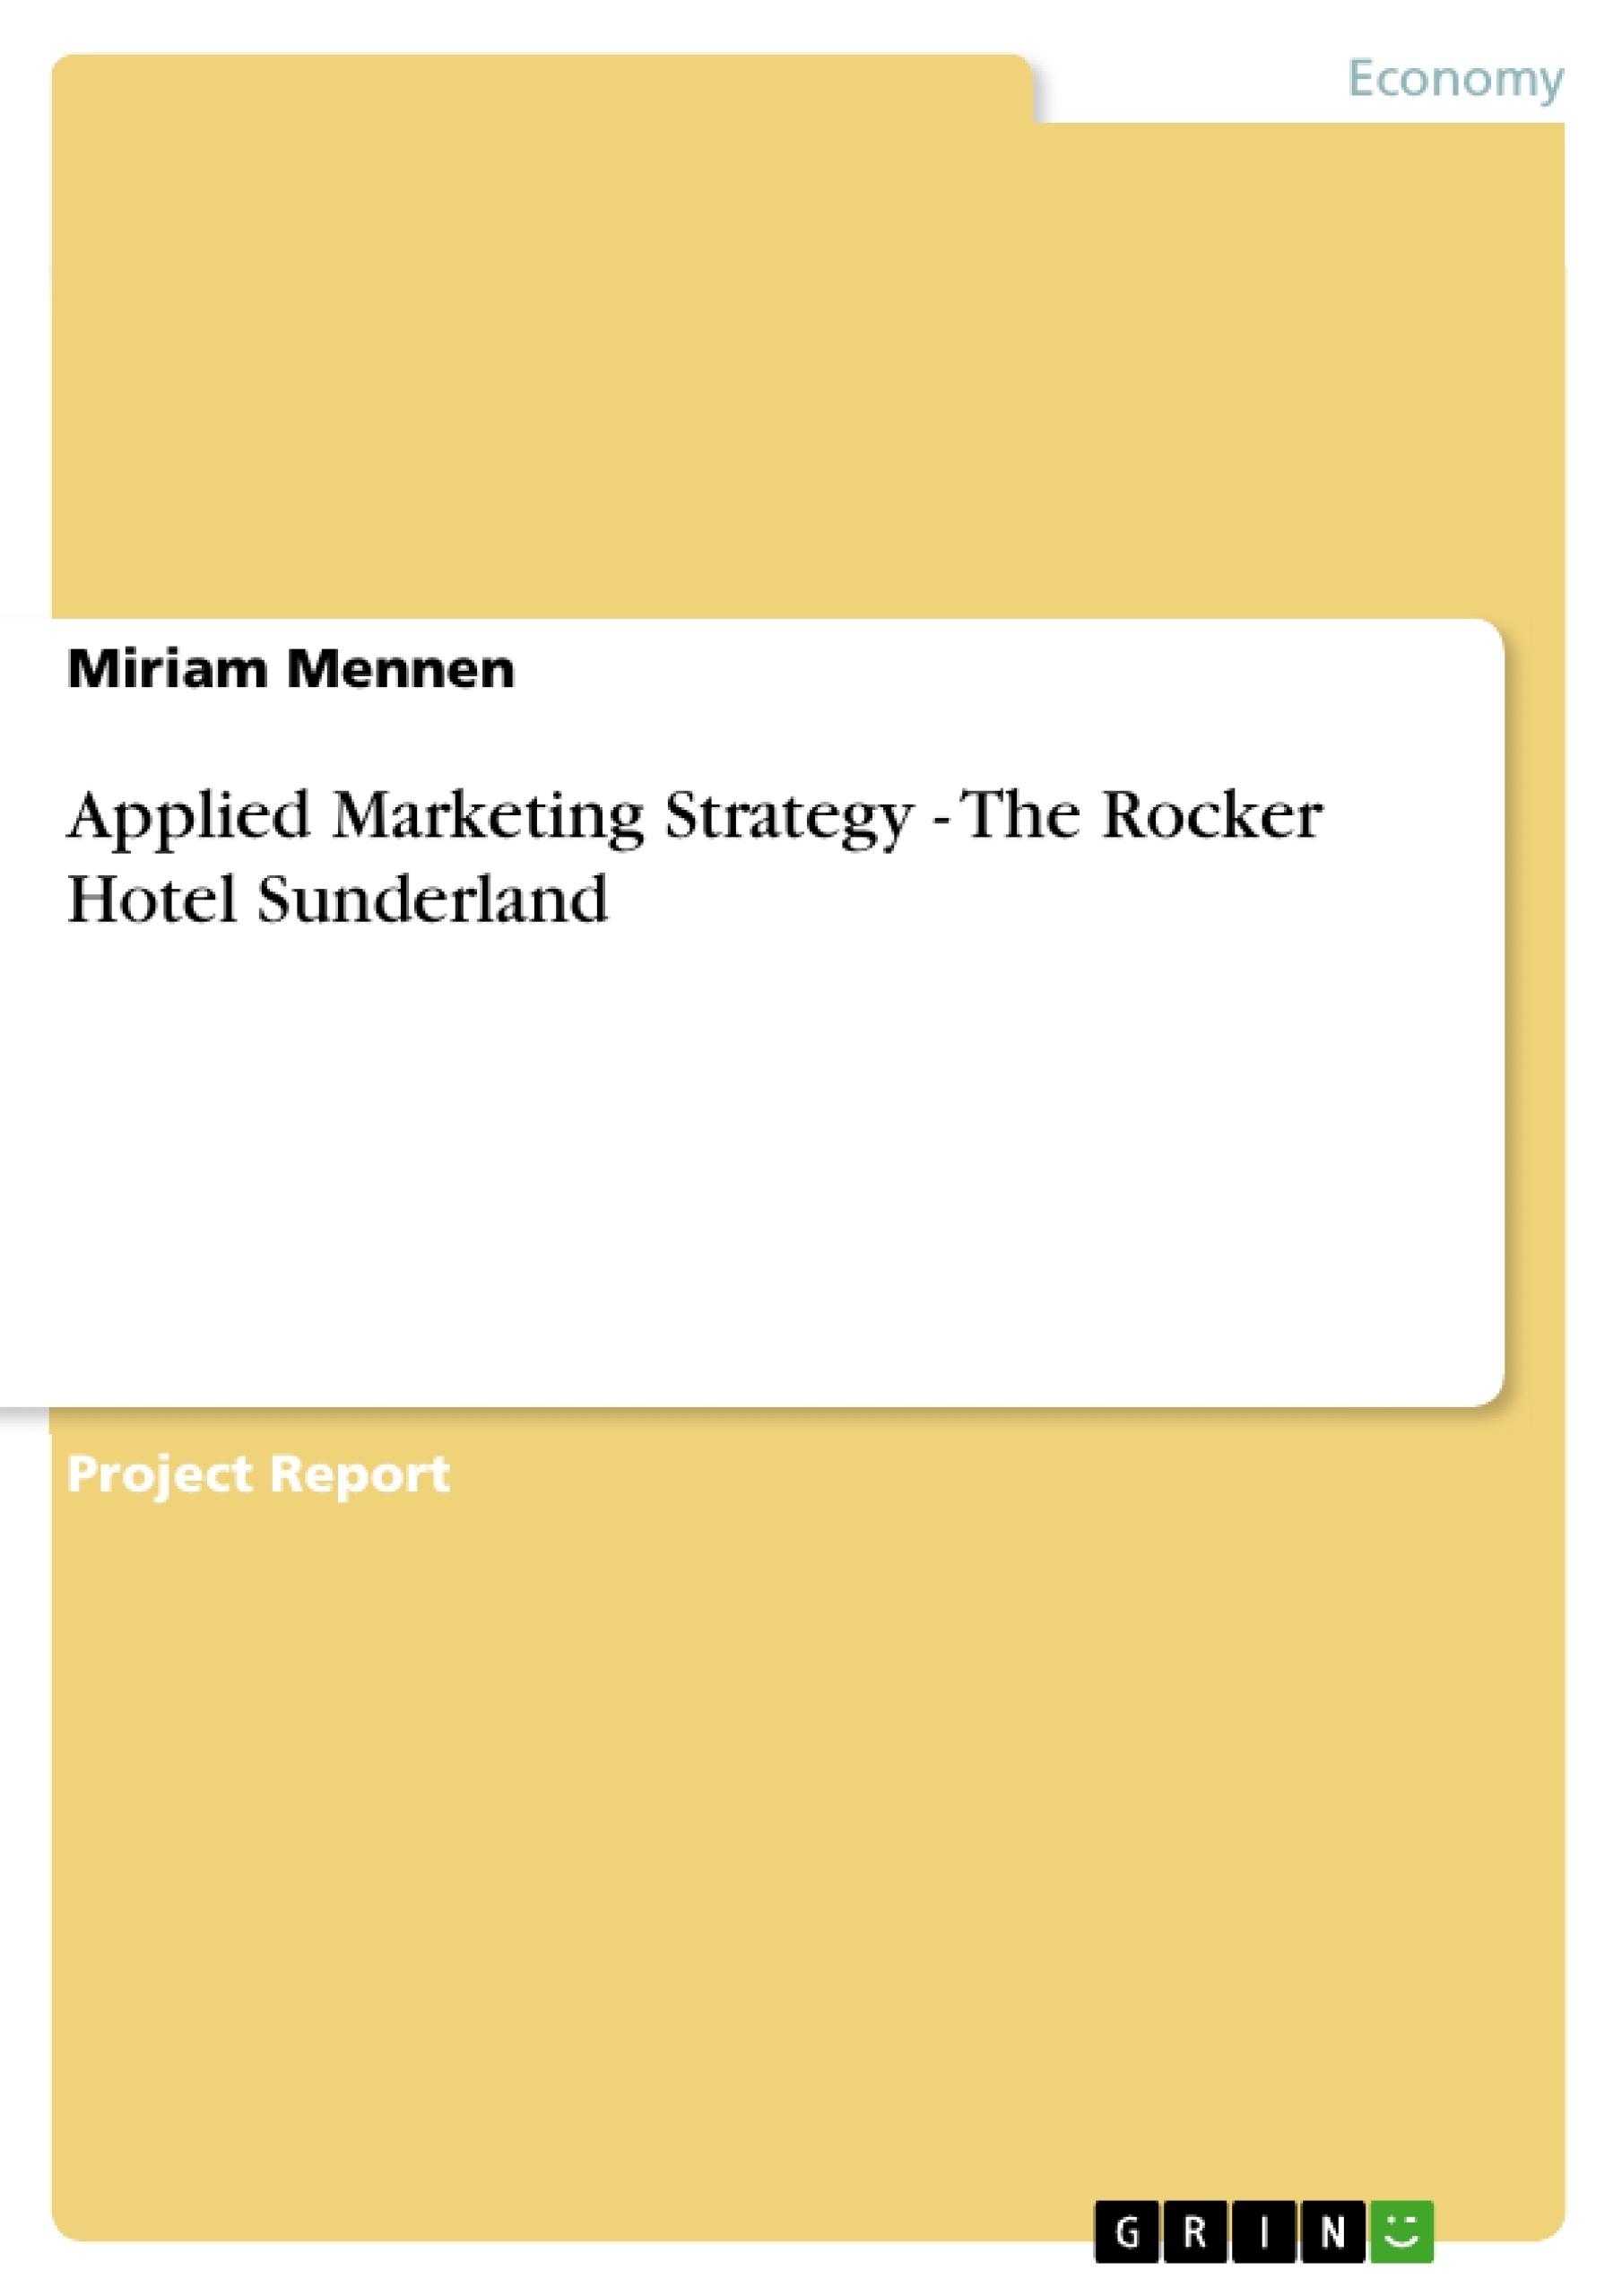 Title: Applied Marketing Strategy - The Rocker Hotel Sunderland